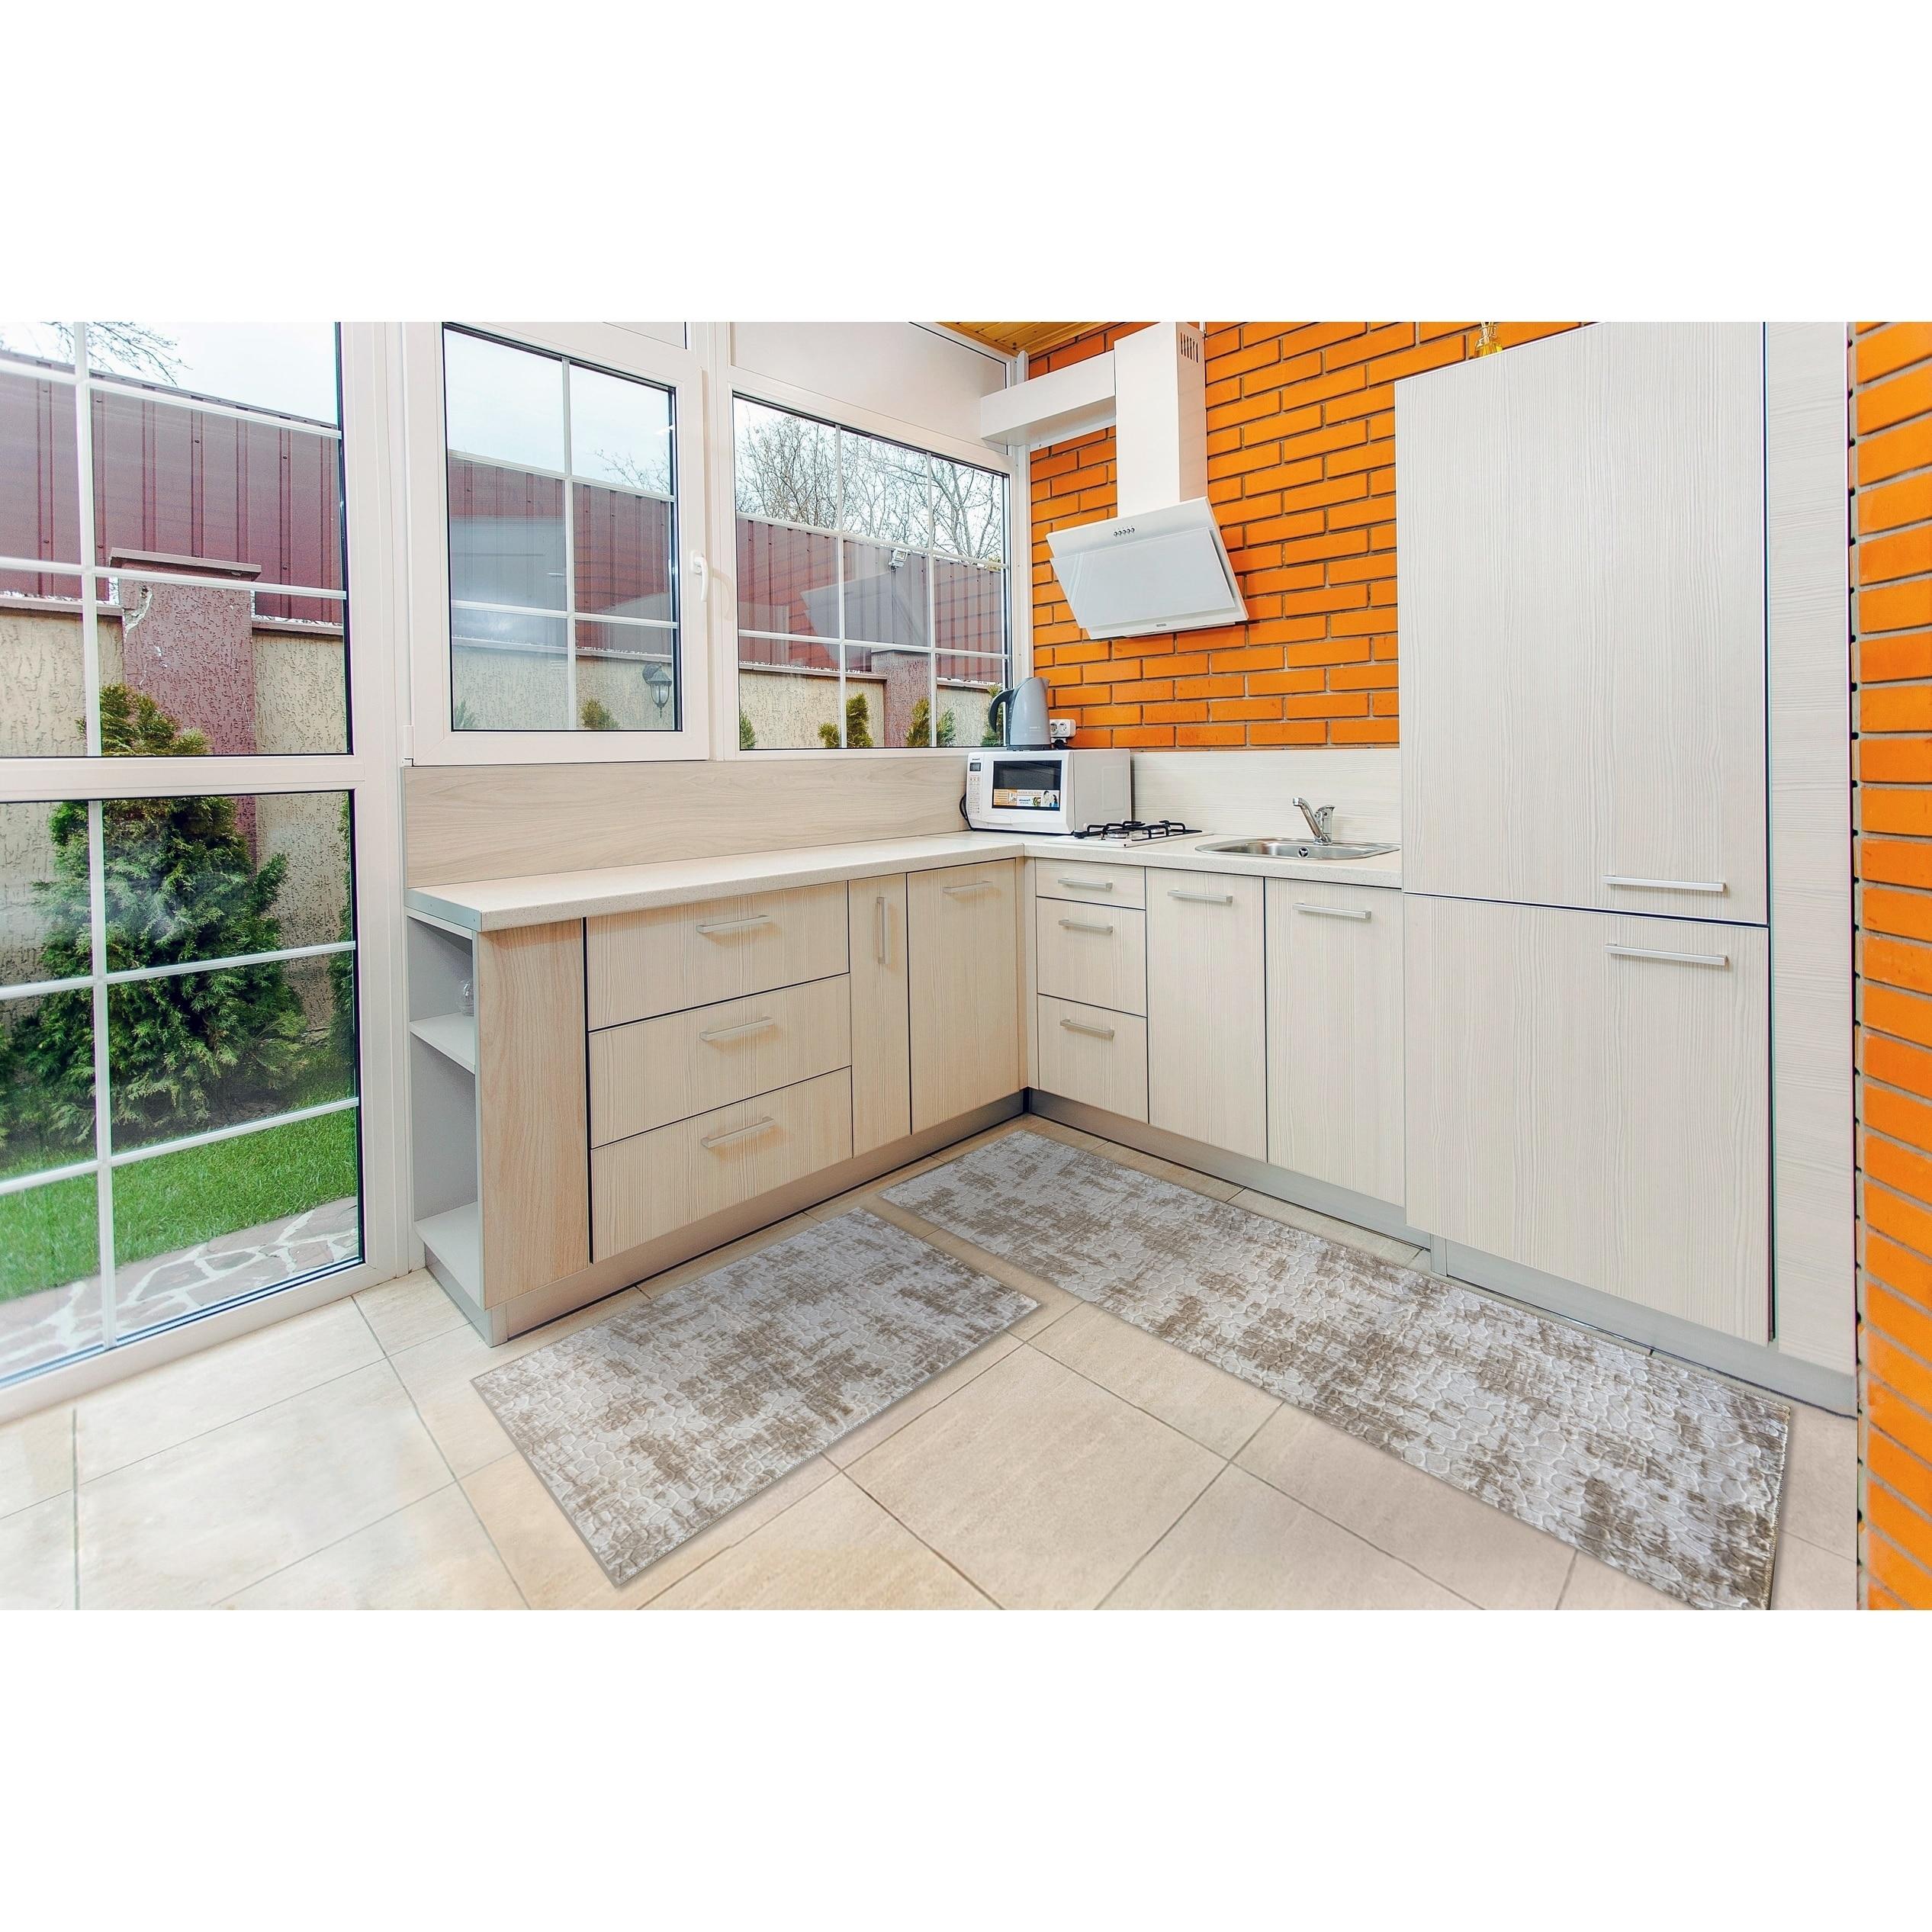 Shop Kitchen 2 Set 16x24 16x47 Newruz Print Bath Mat Absorbent